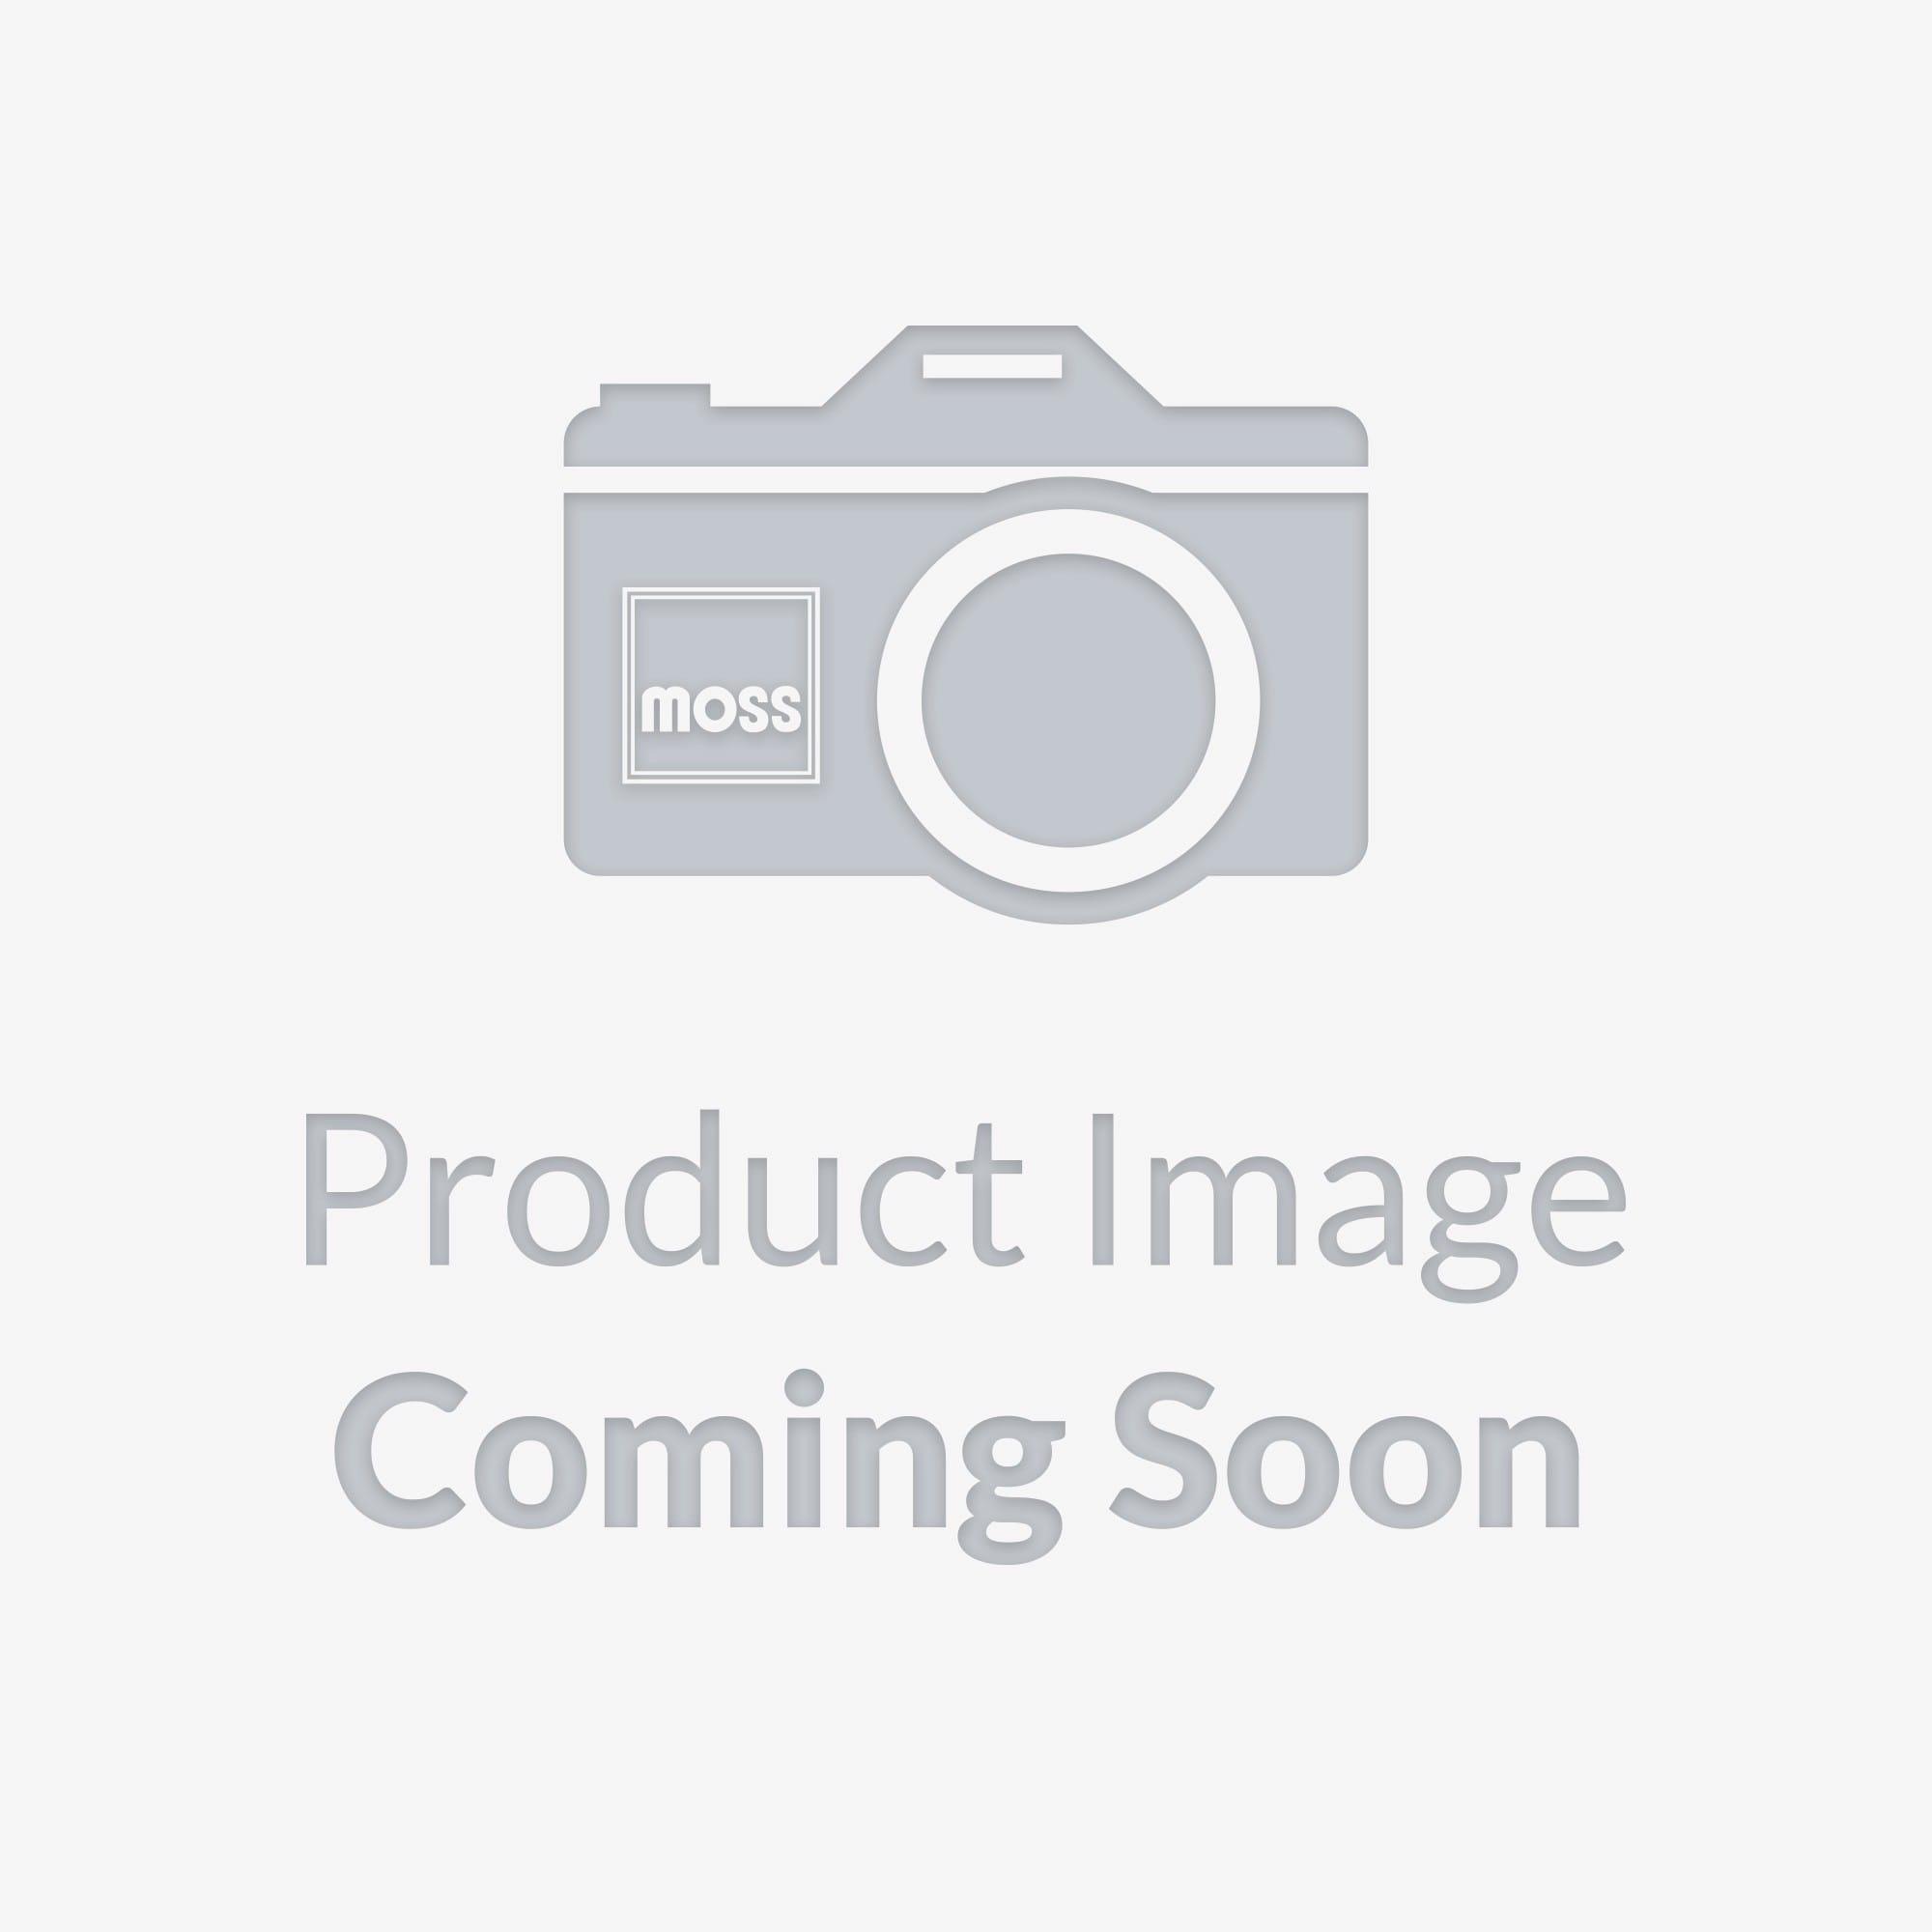 231 354 Triumph Motor Company Lighted Sign Moss Motors